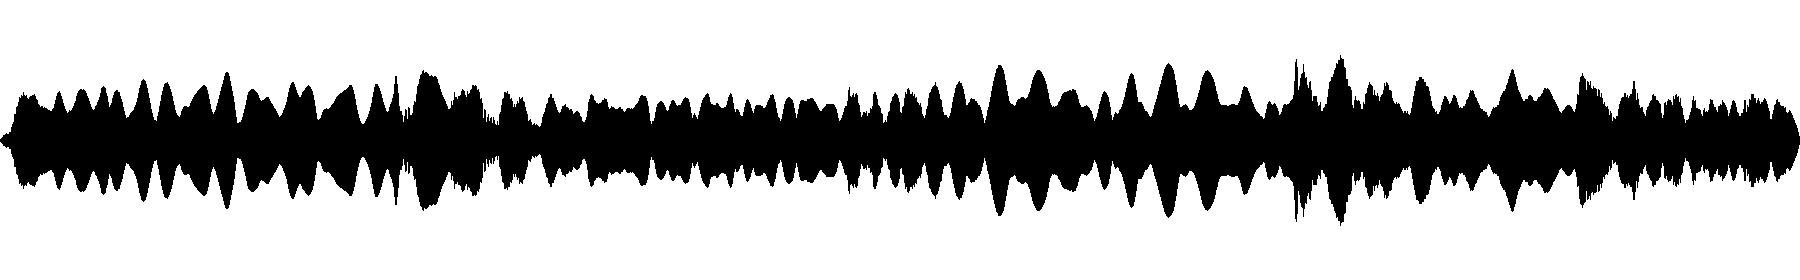 ct2 120 fm mono synth sand